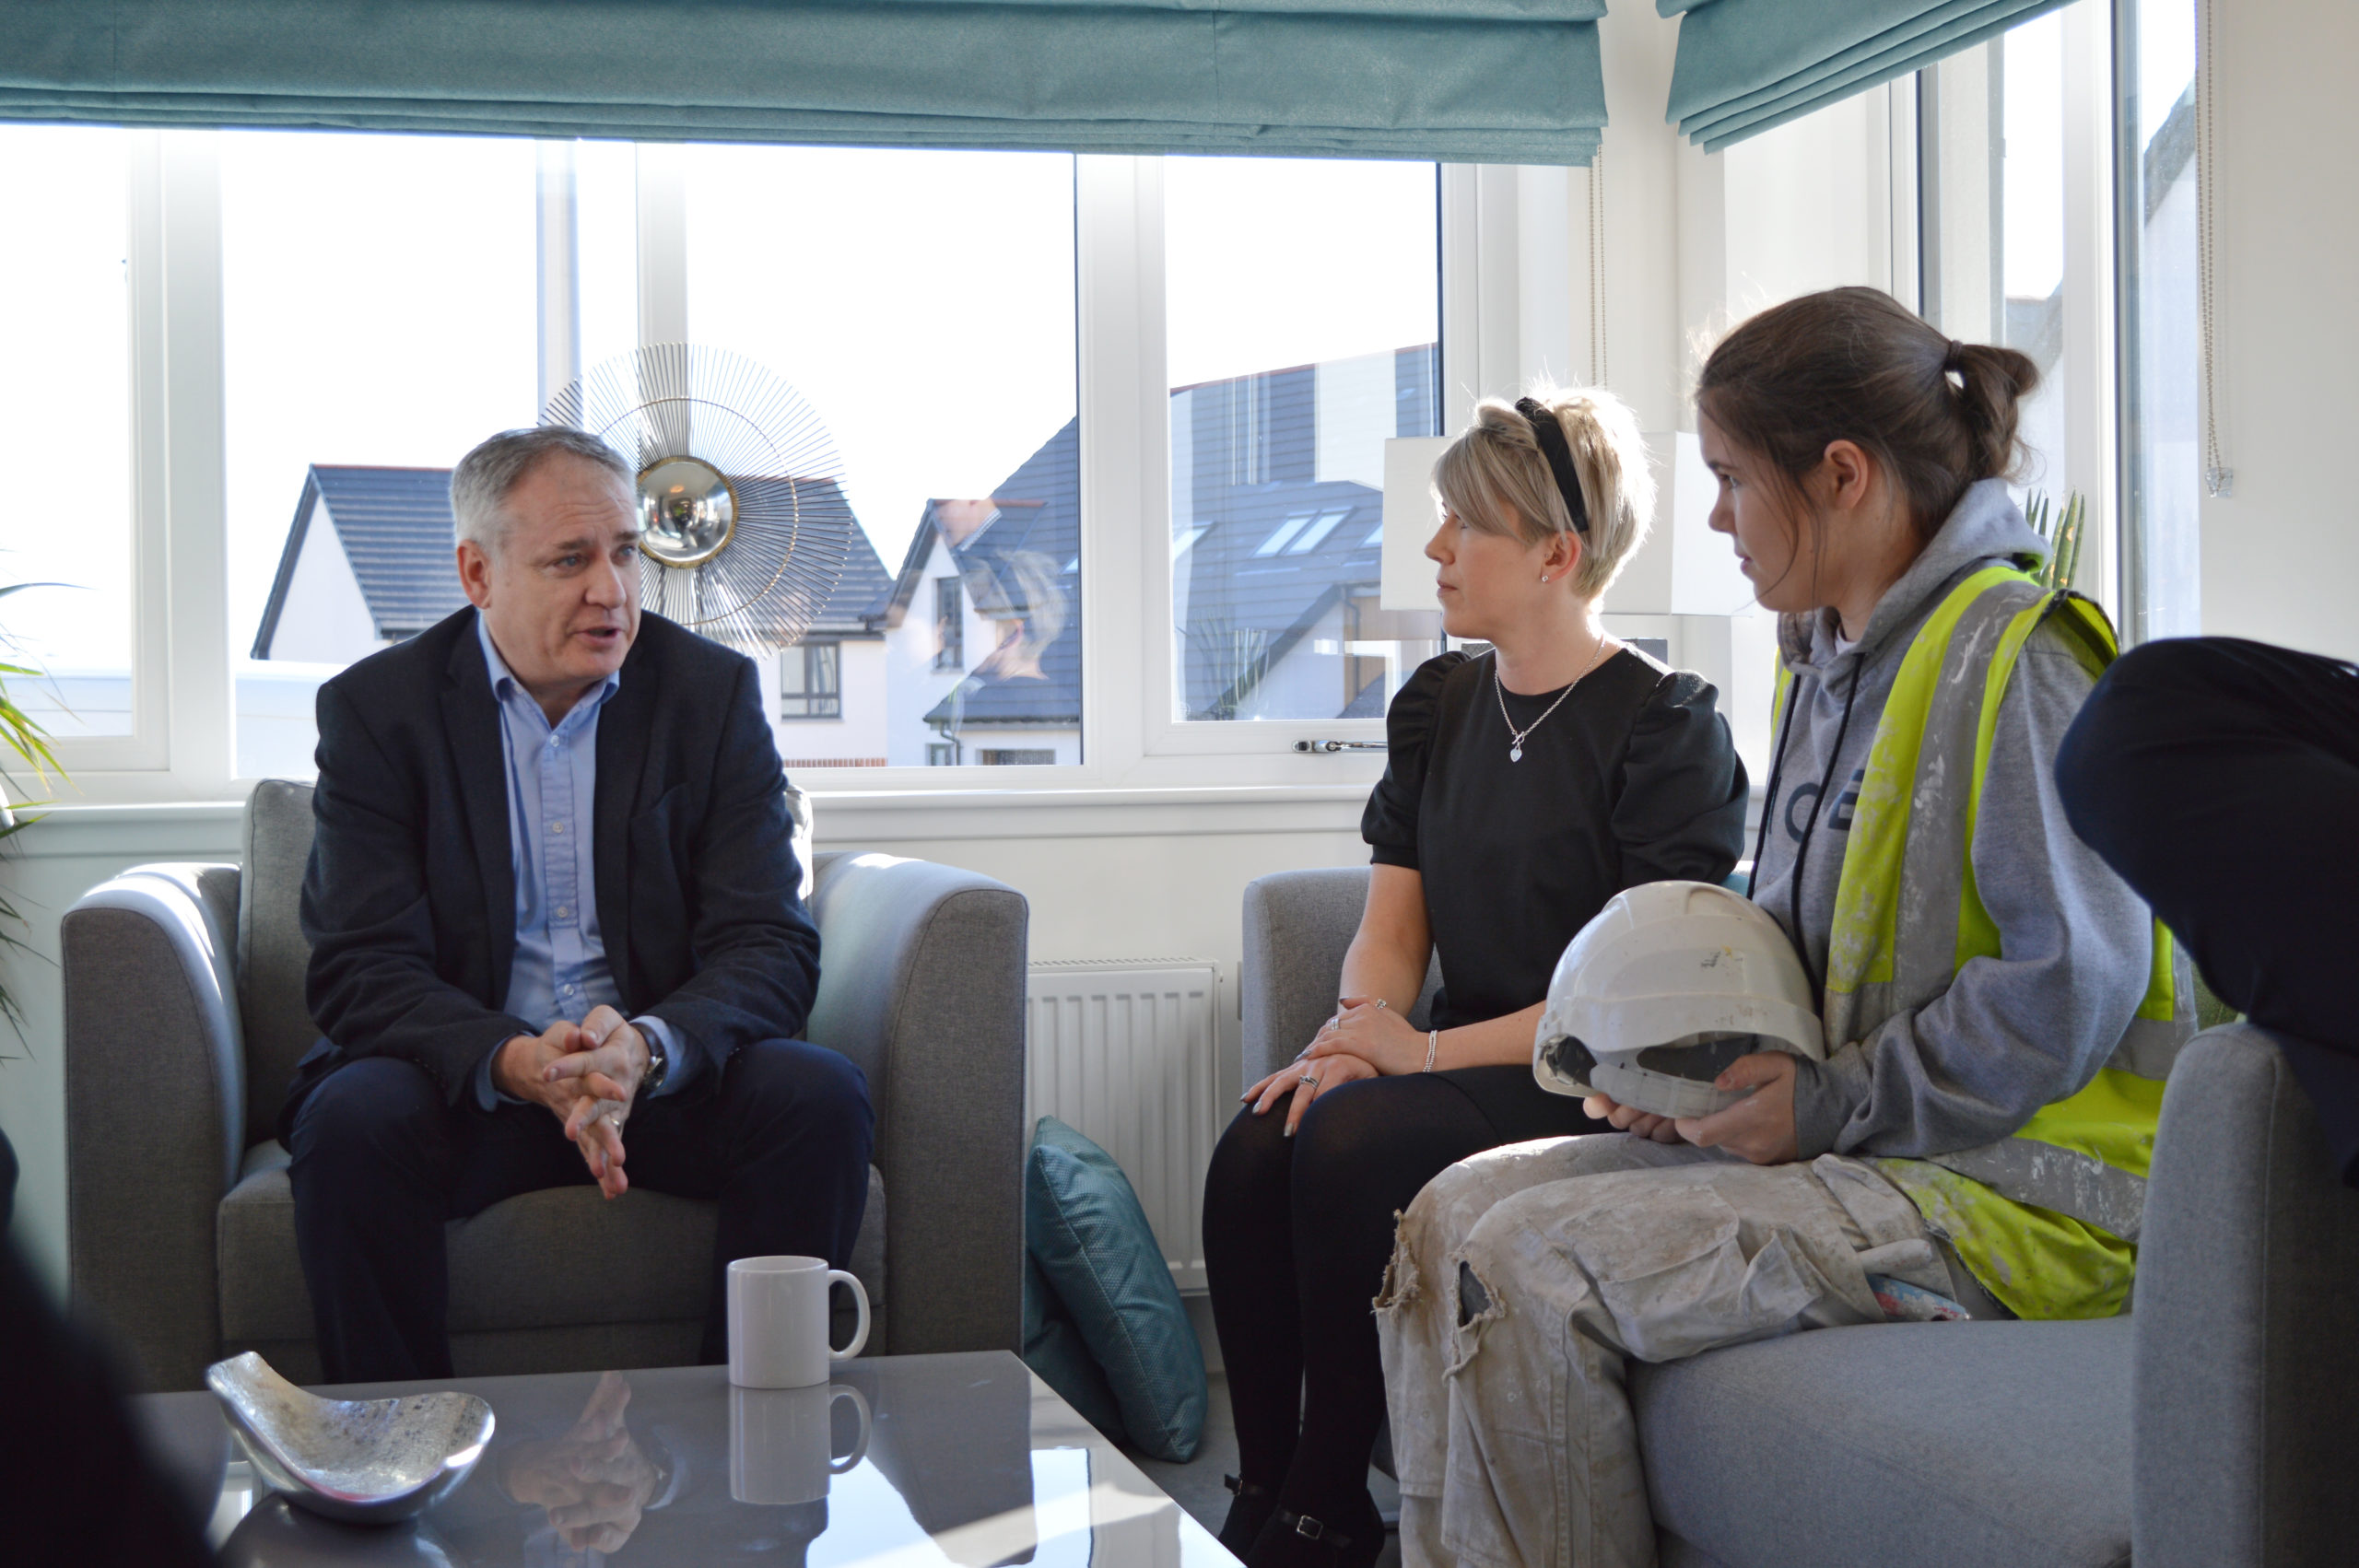 Scottish Government minister Richard Lochhead with Springfield's senior HR advisor Diane Kemp and apprentice painter Sophia Massie.